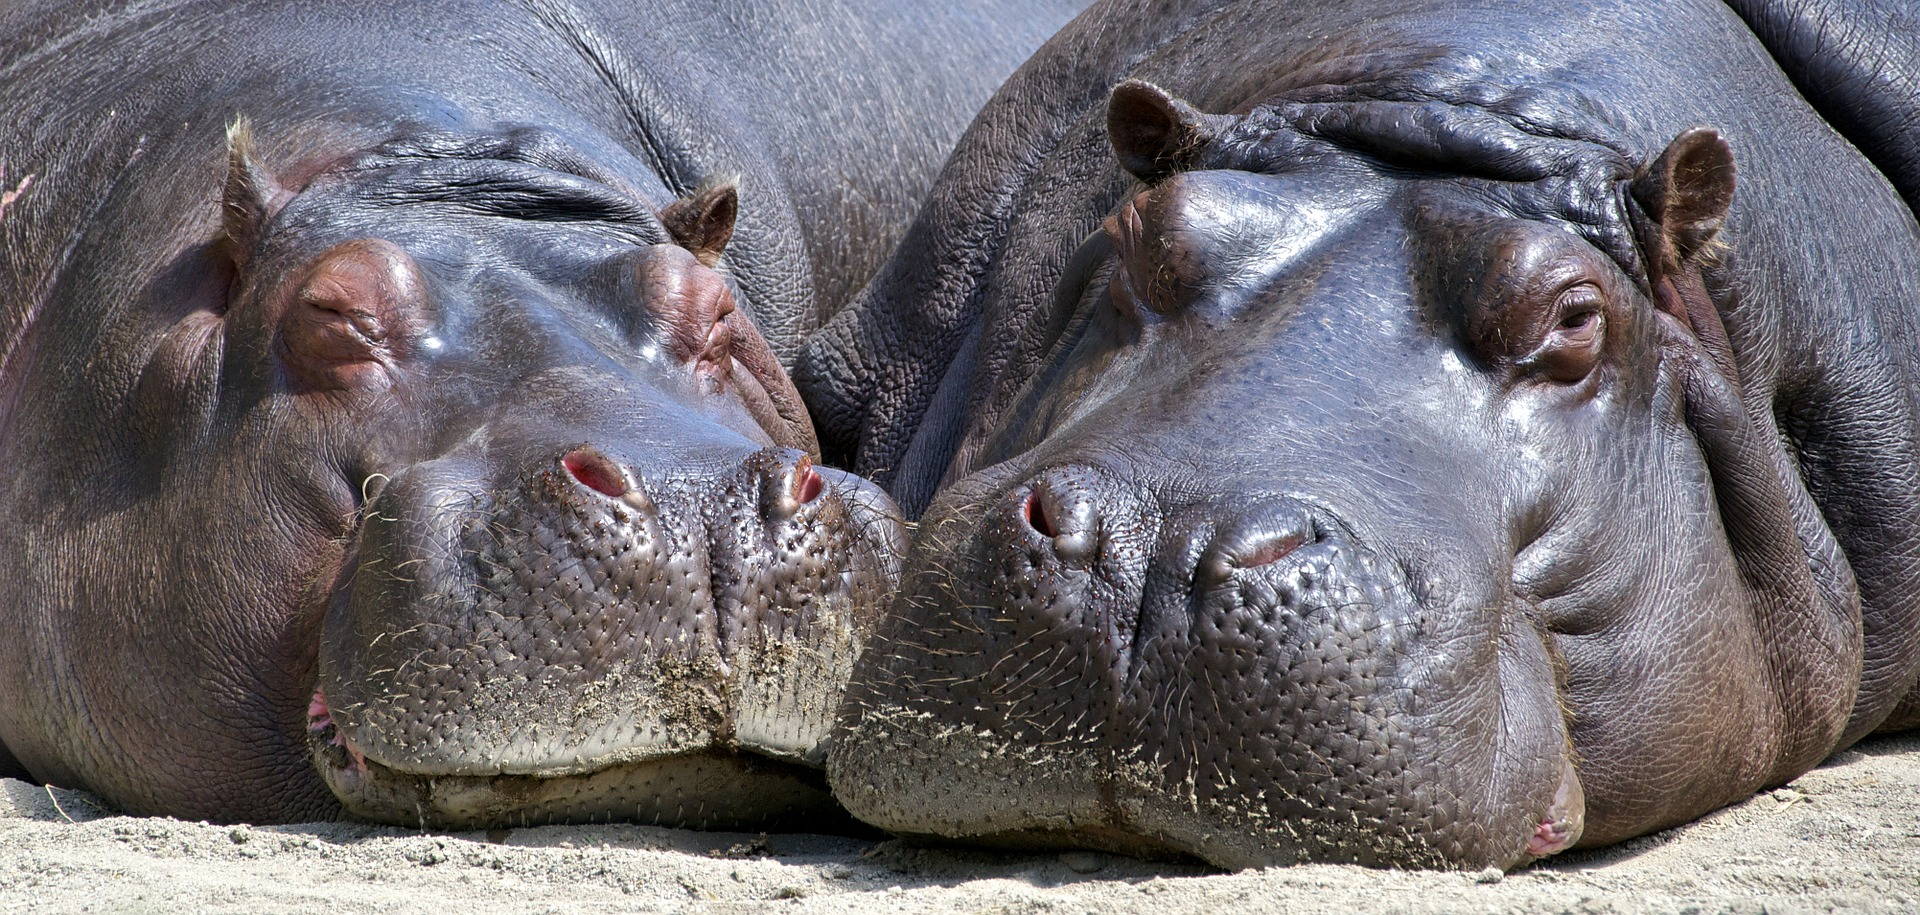 Flusspferd - hippo